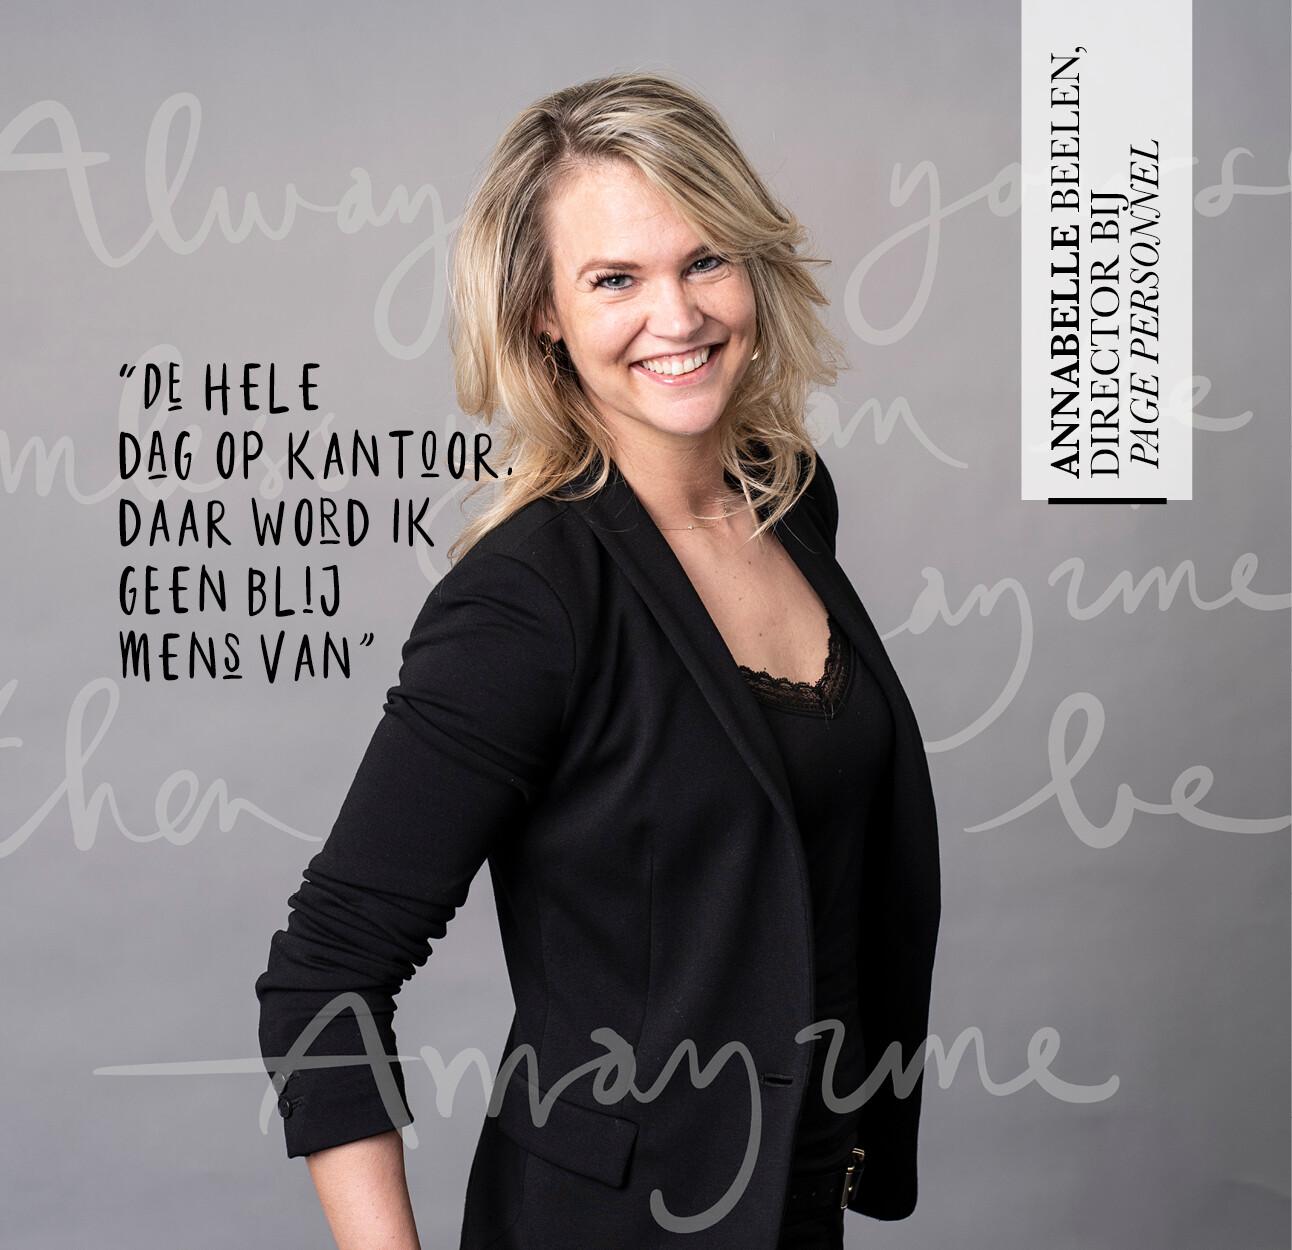 Annabelle Beelen